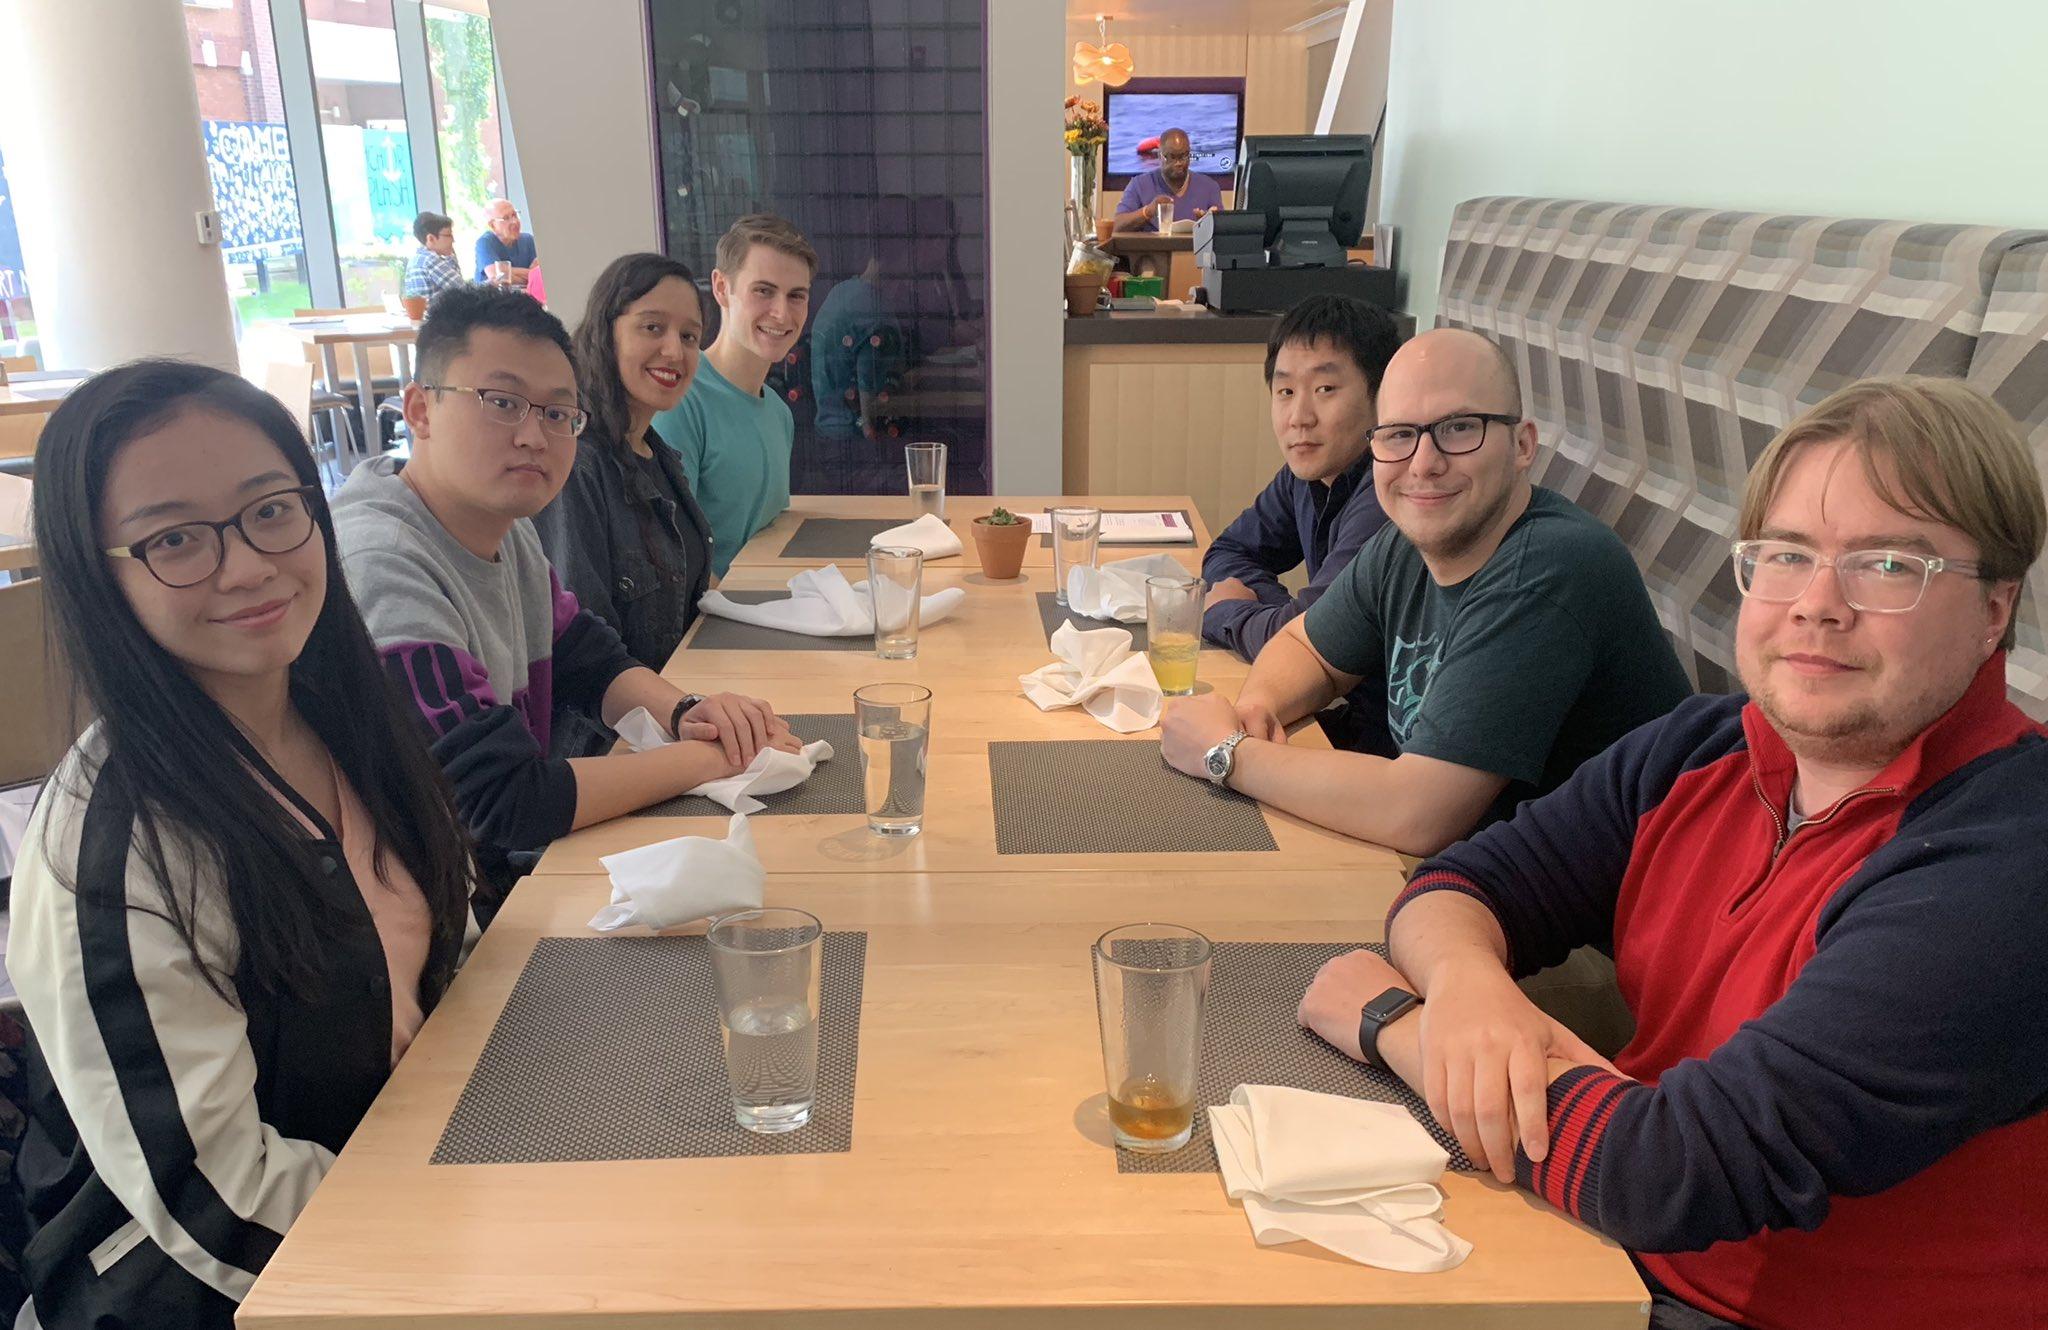 Group Photo - October 2018Weiwei Kong, Yuan Wei, Gabriela Justino, Jason Linn, Xiaolong Lang, Bill Lenart, MJAH.